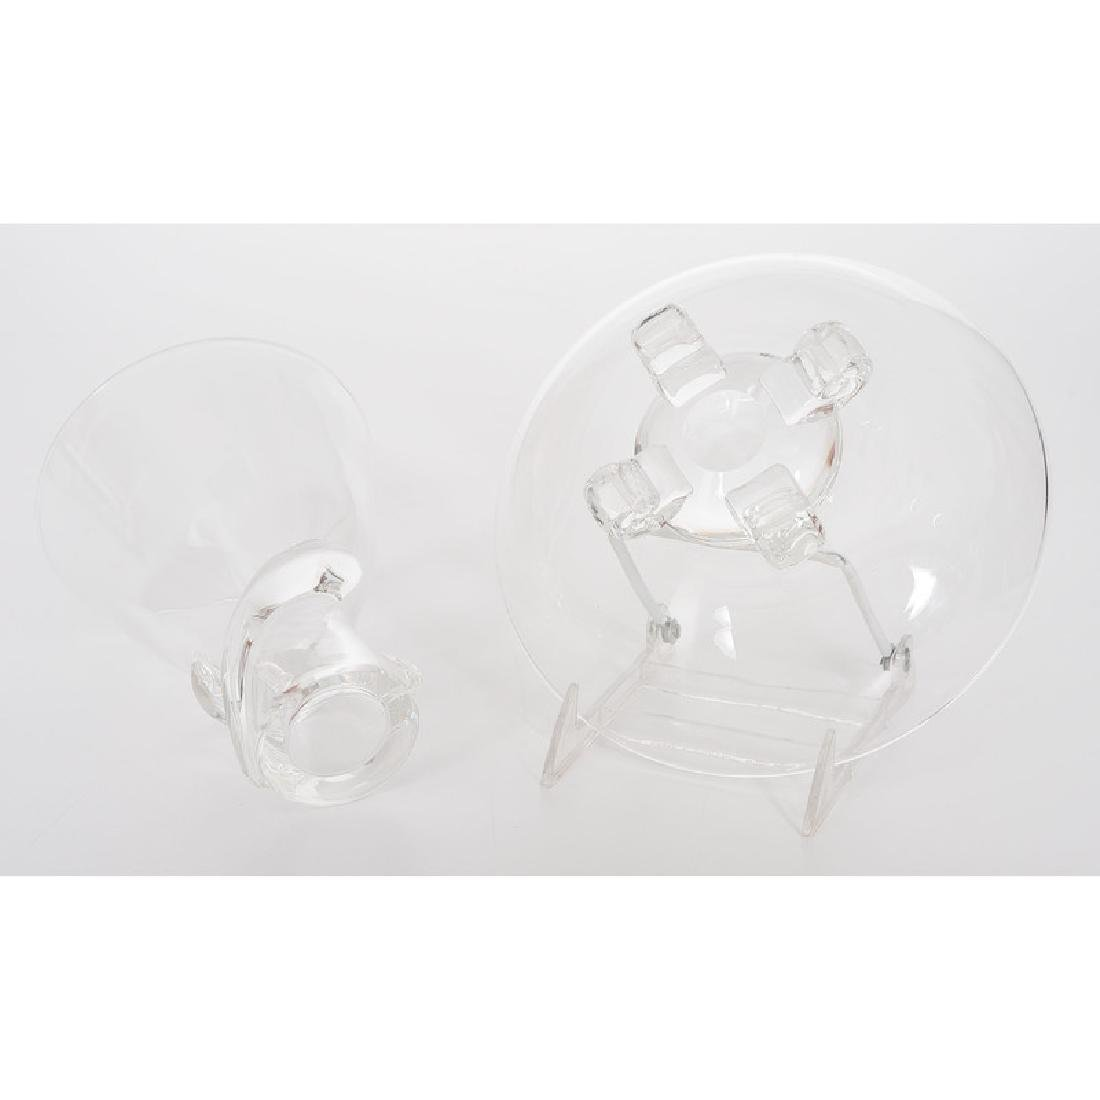 Steuben Crystal Vase and Bowl - 6